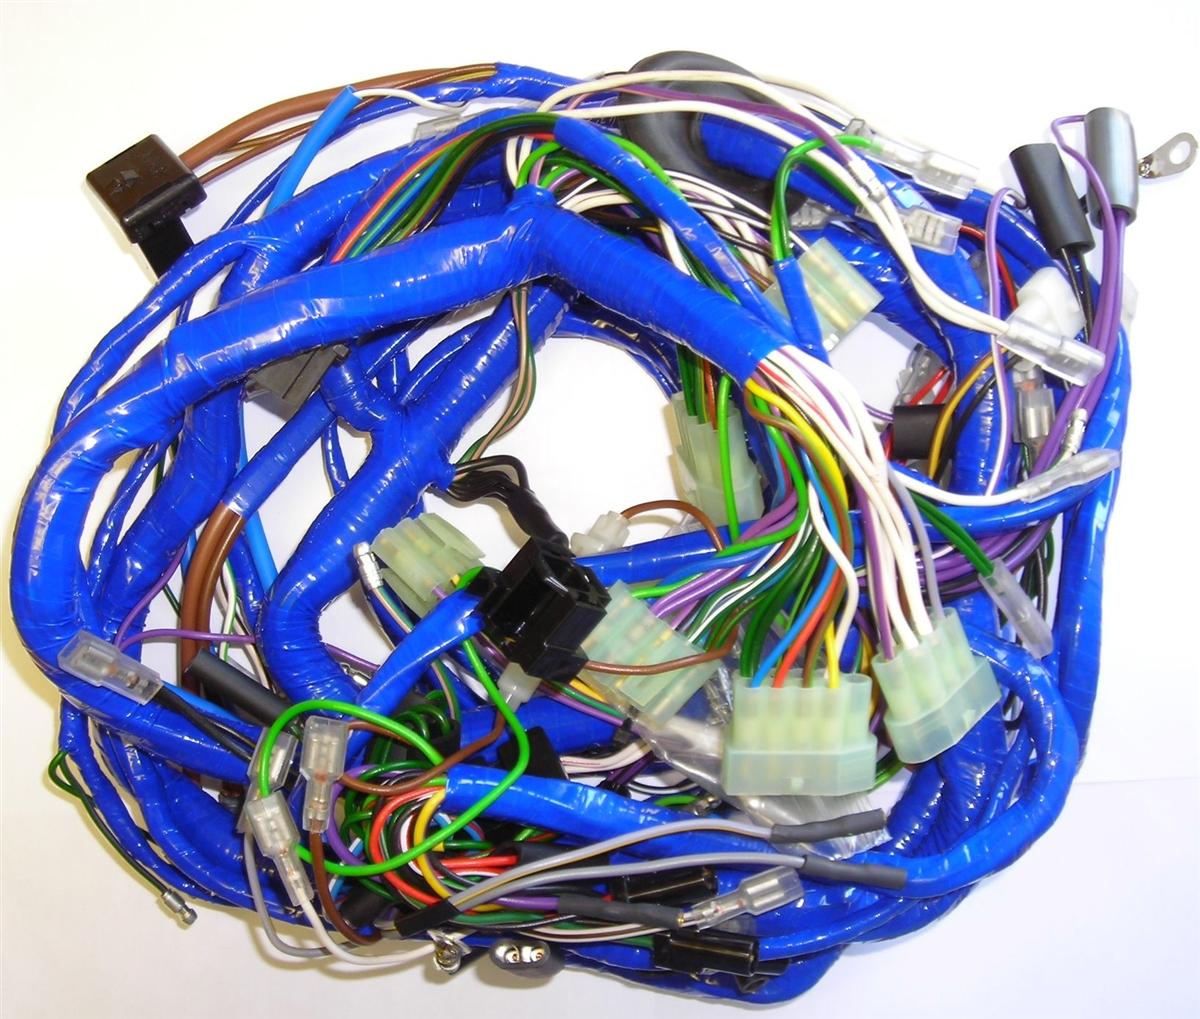 Mgb Wiring Harness - wiring diagram on the net on mgb wiring-diagram, mgb seats, mgb overdrive wiring, mgb alternator wiring,